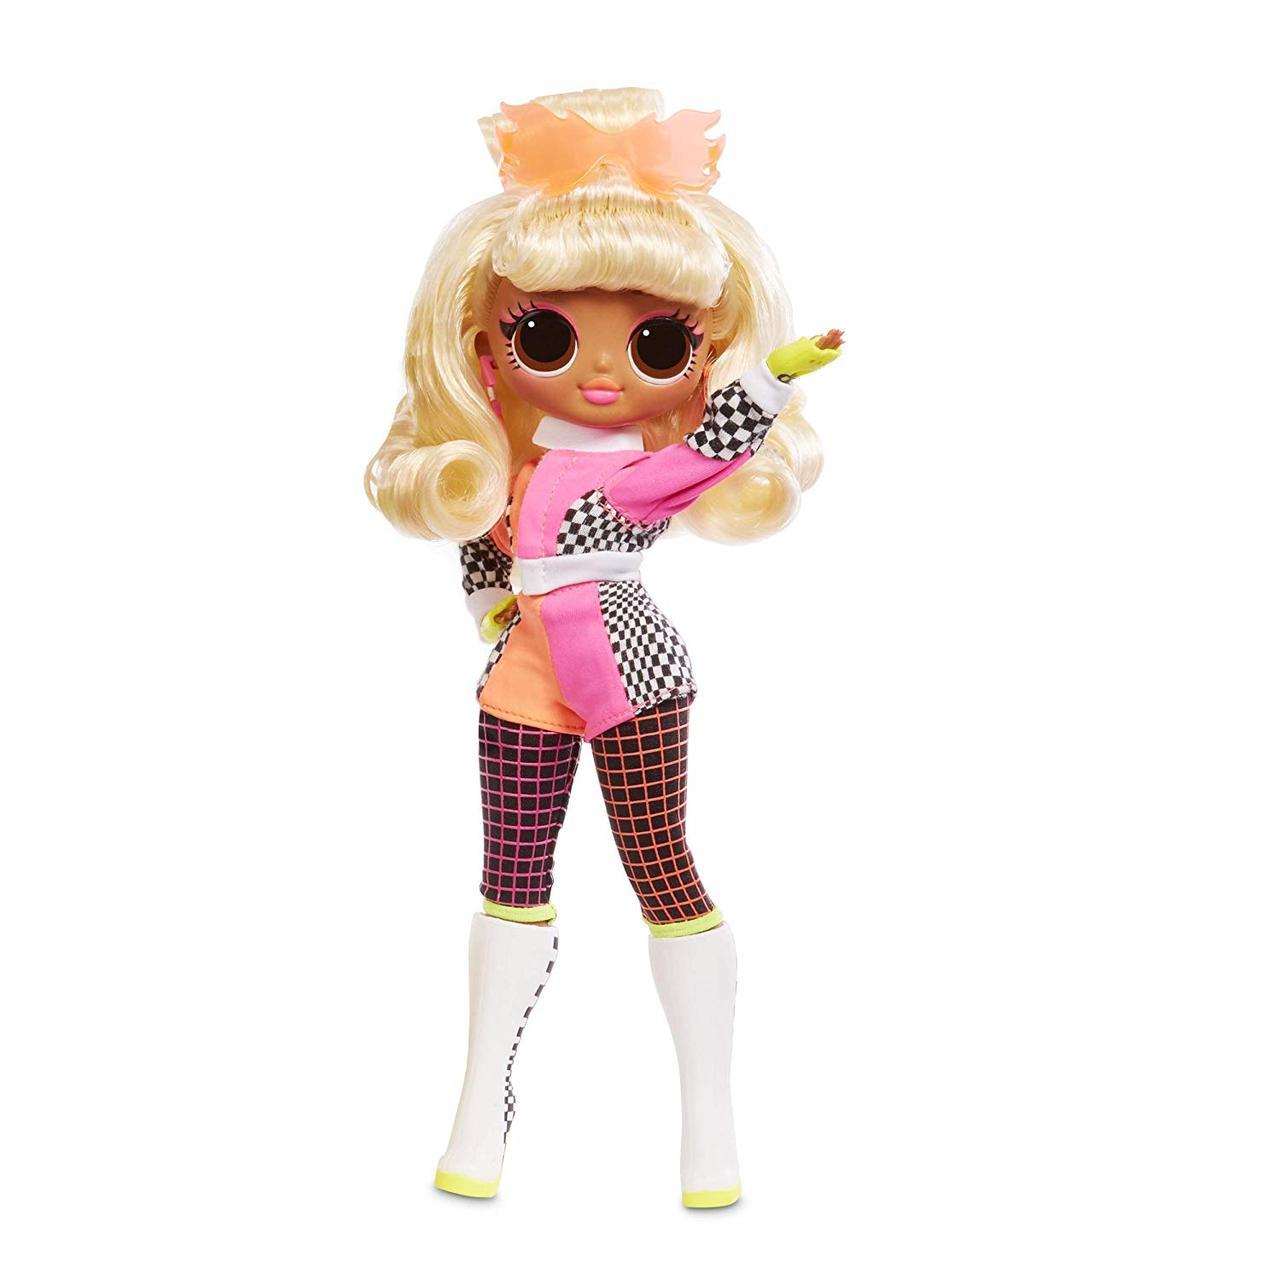 Кукла ЛОЛ ОМГ леди Гонщик Спидстер L.O.L. Surprise! O.M.G. Lights Speedster Fashion Doll LOL OMG оригинал omg